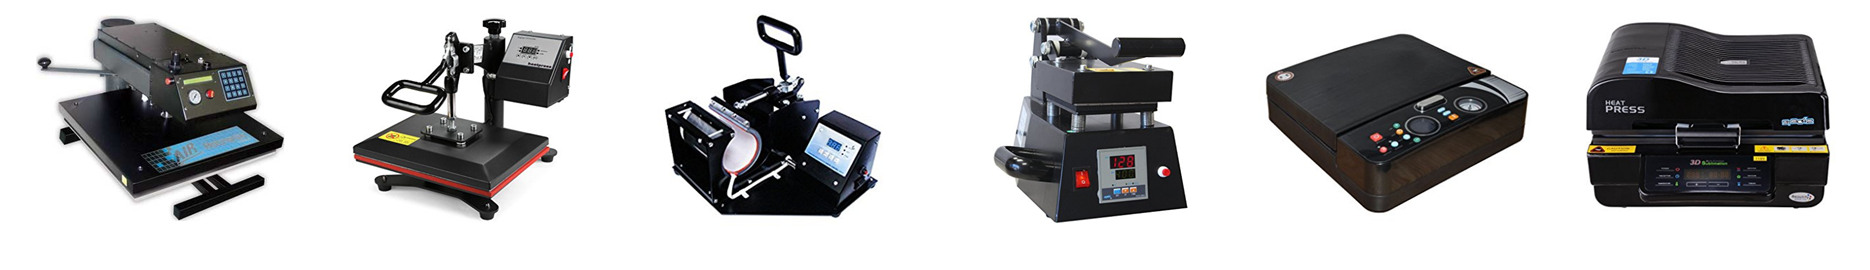 Heat Press Machine buyers guide